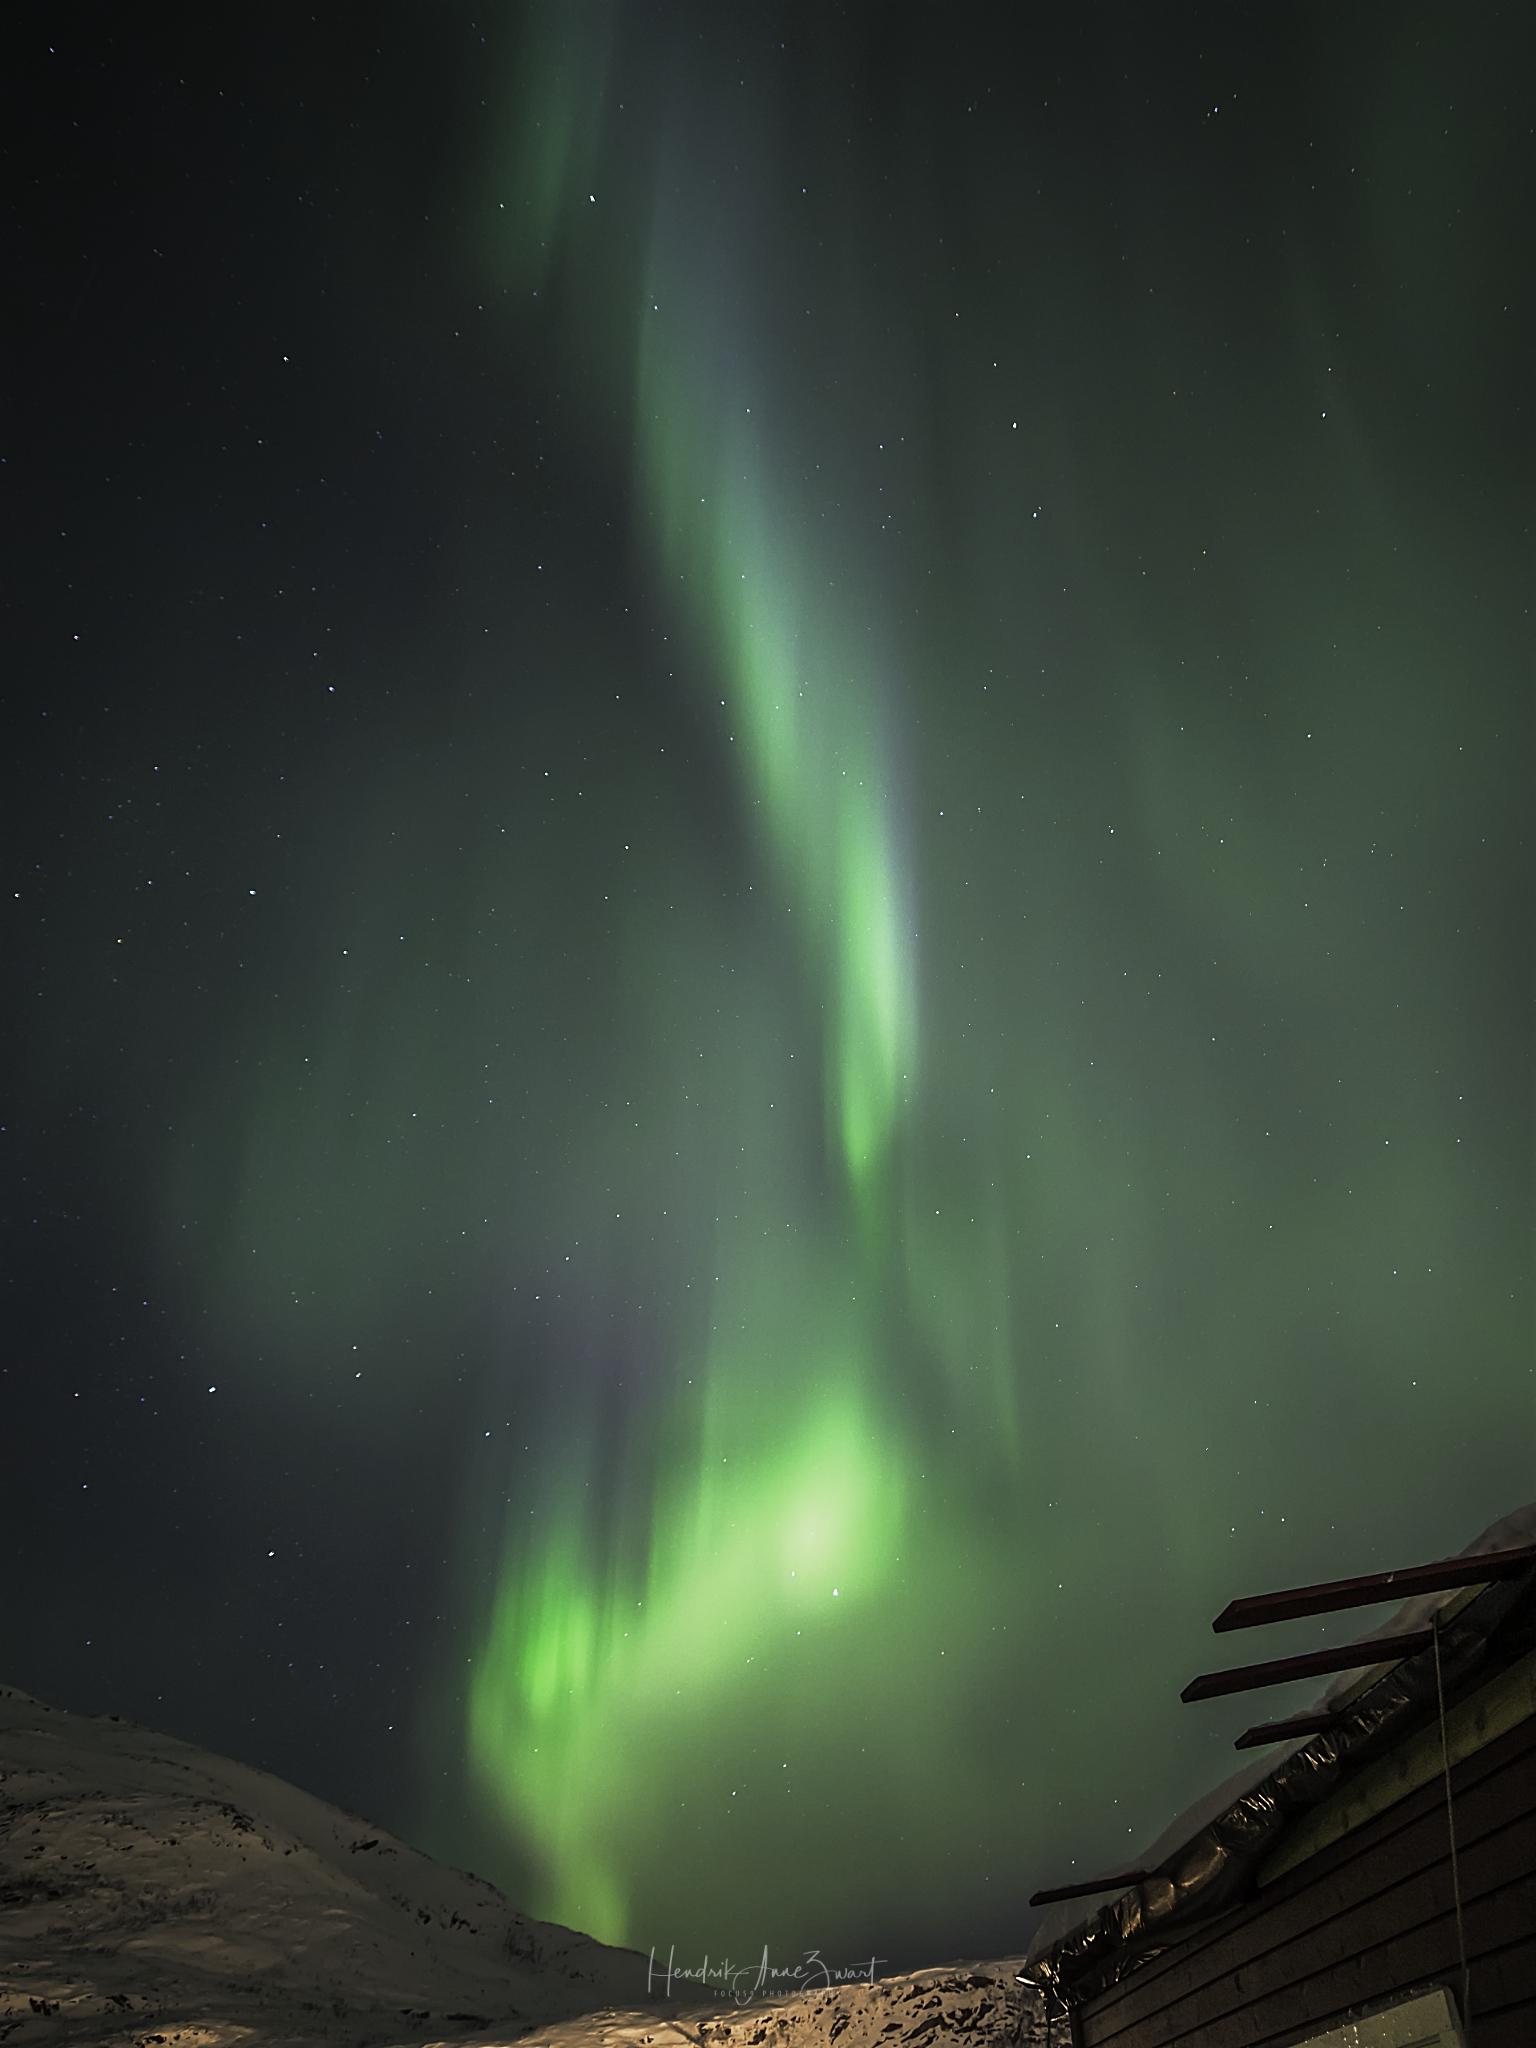 Nordic_Light_Notthern_Lights_Norway_Ersfjordbotn_4.jpg